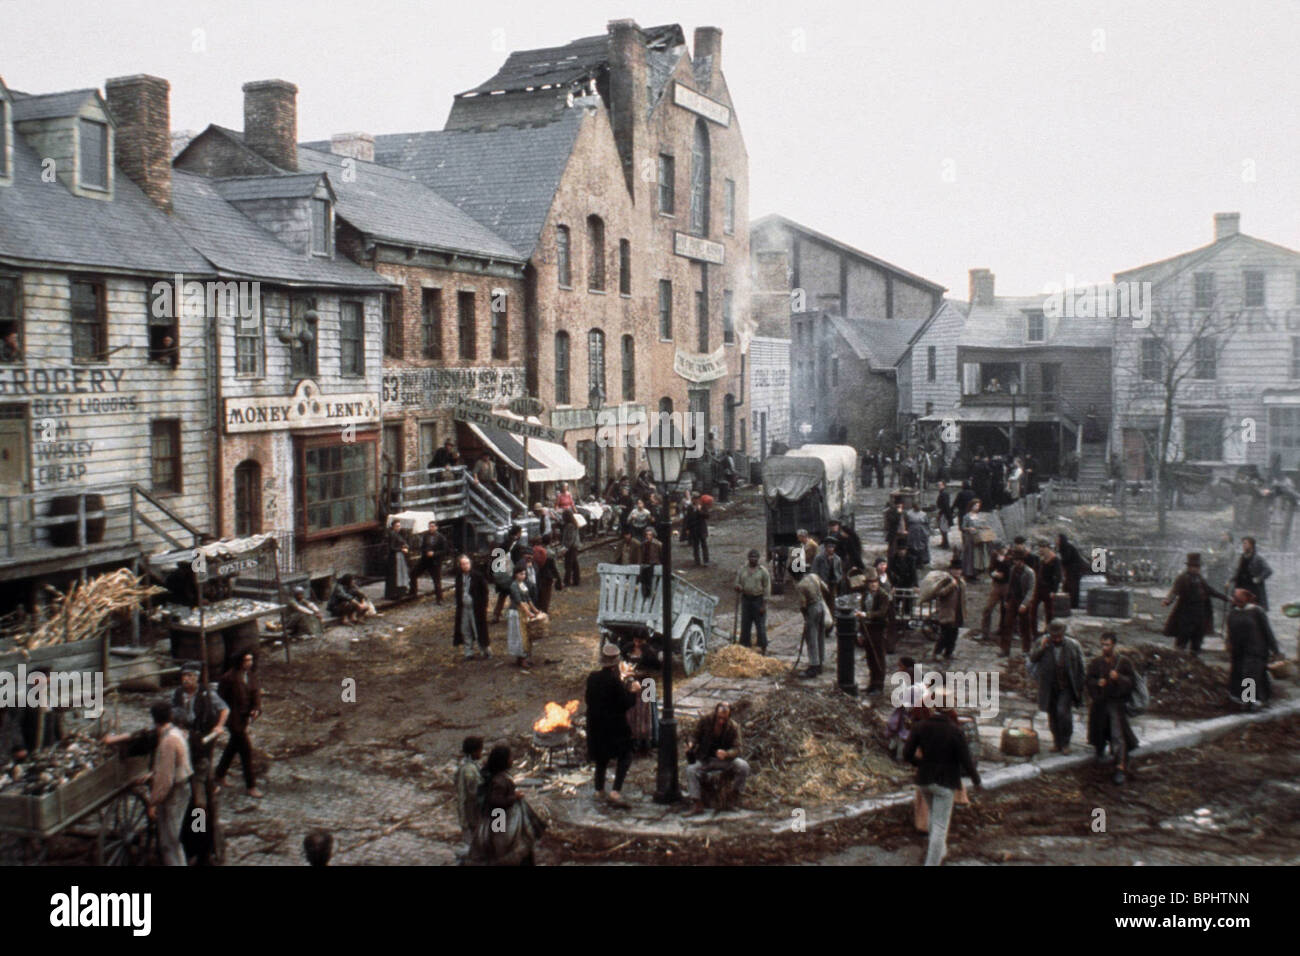 Town Scene Gangs Of New York Stock Photo Royalty